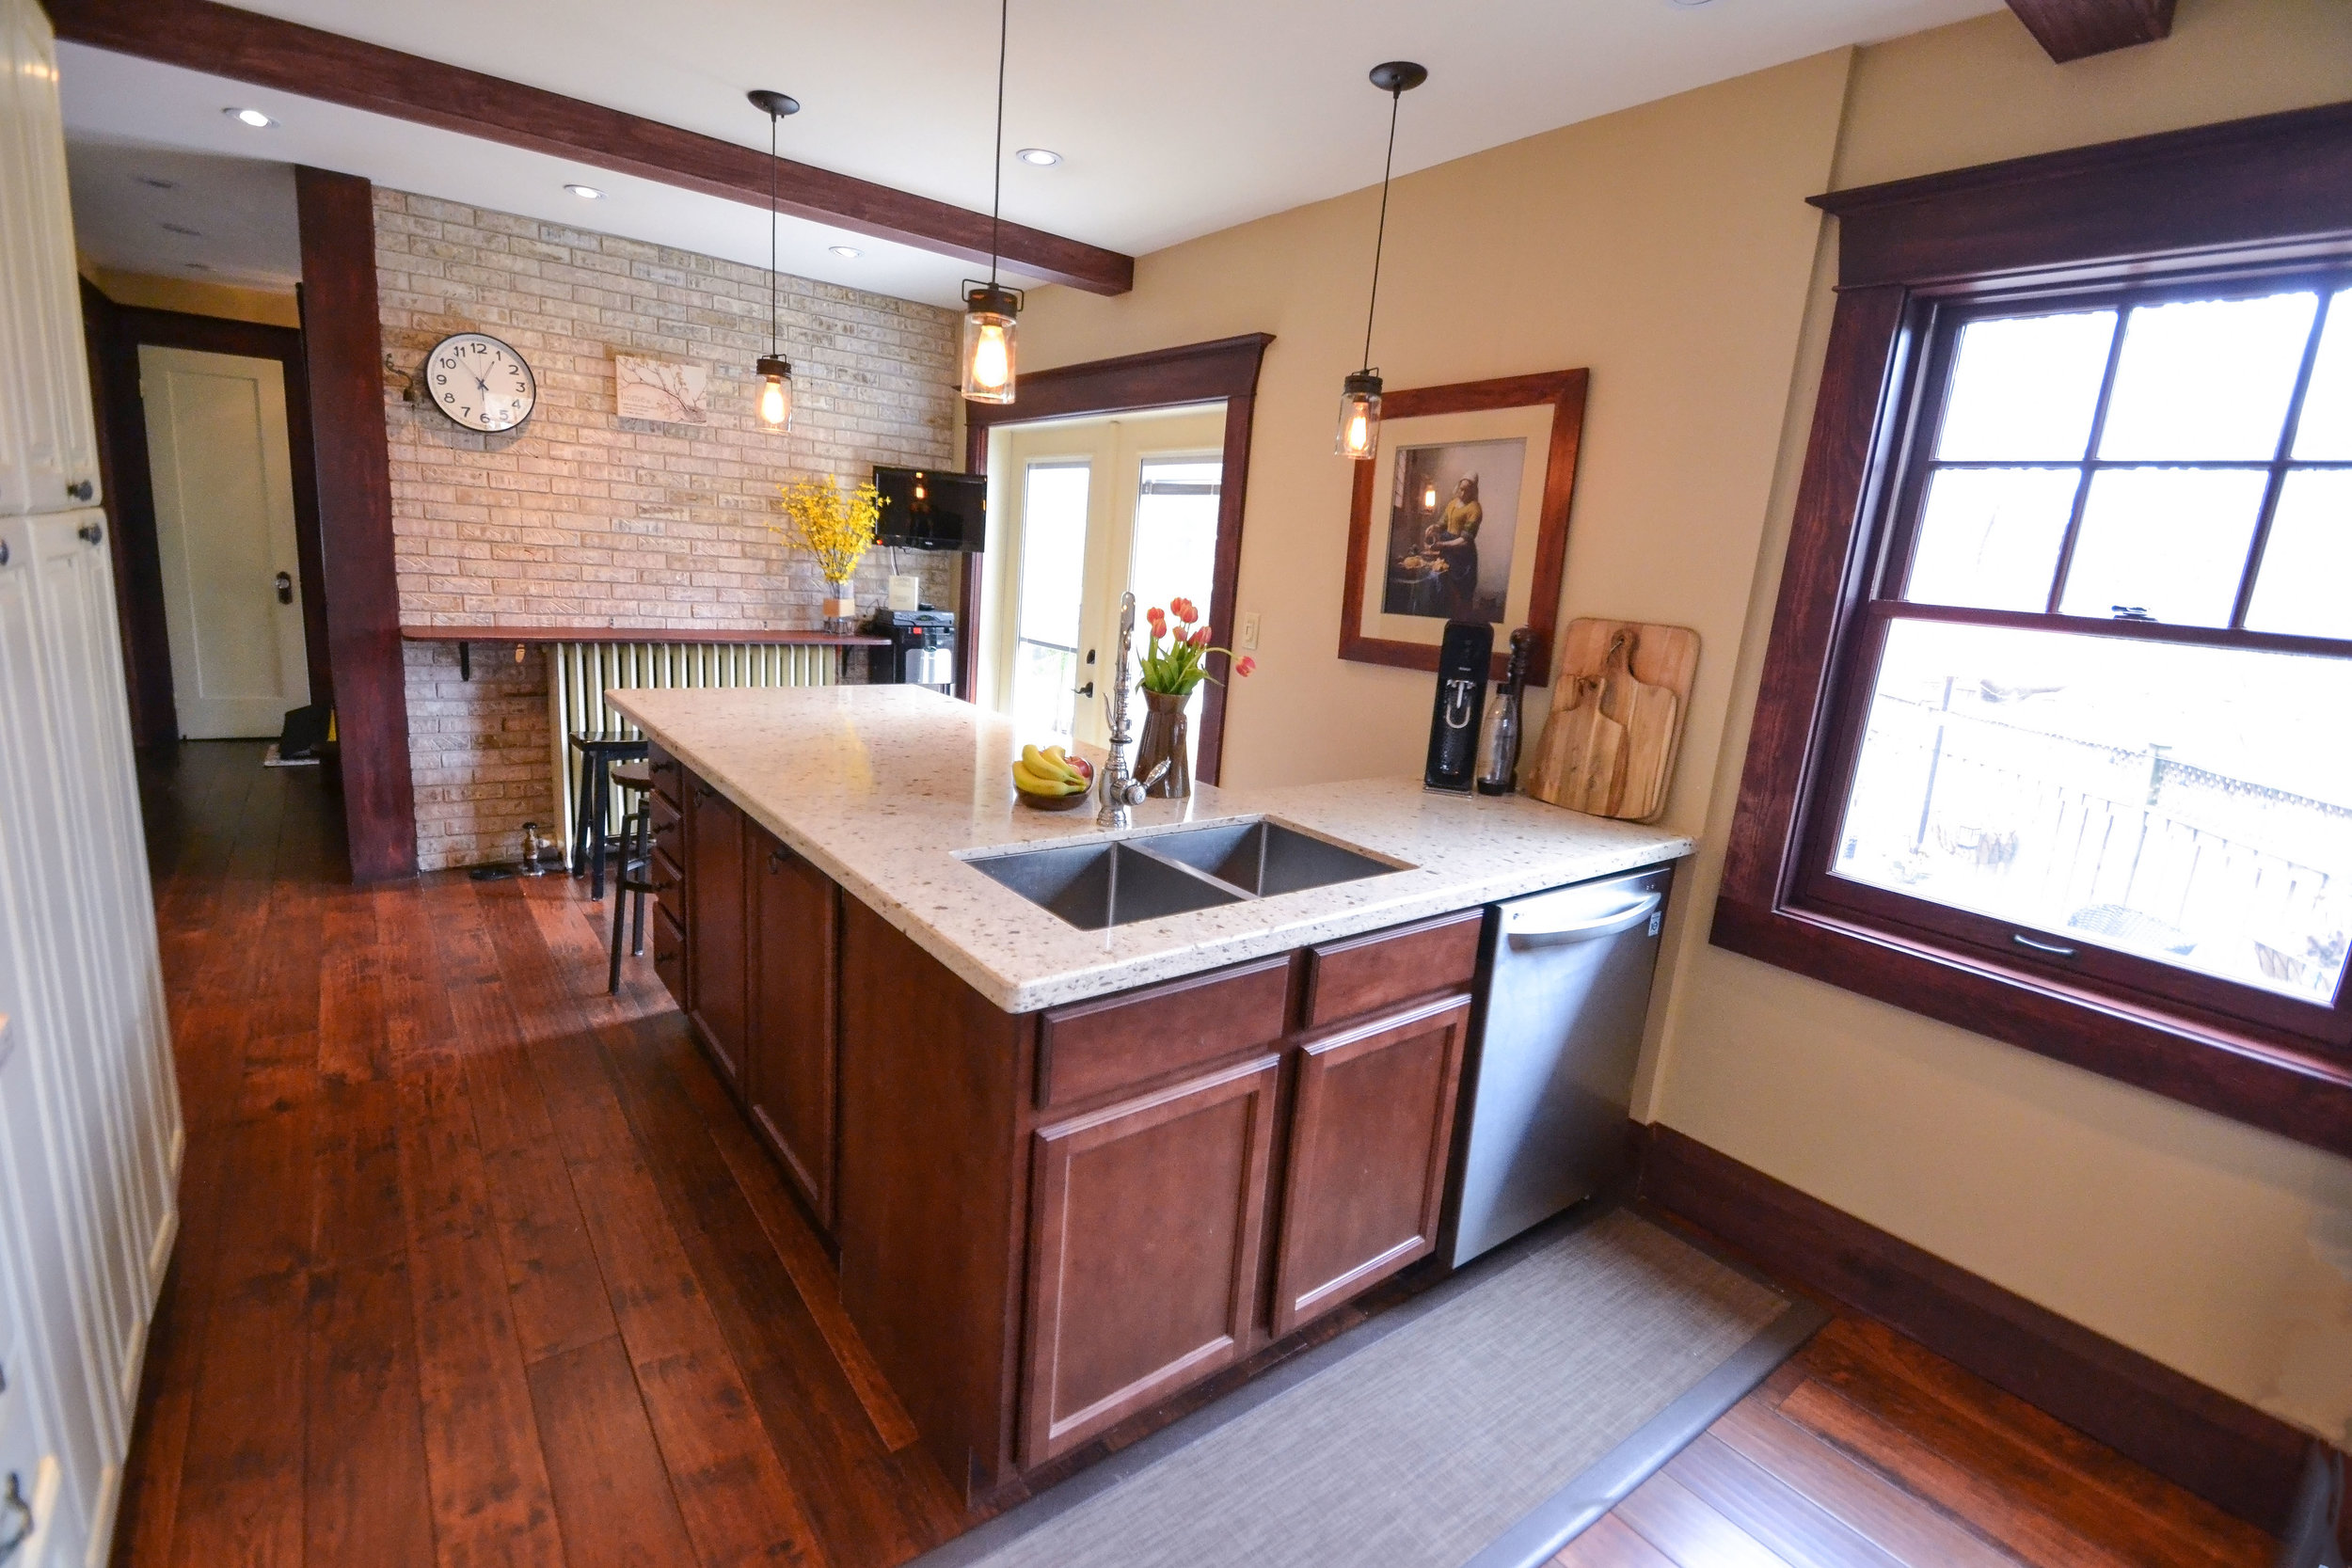 Kitchen to Wall.jpg